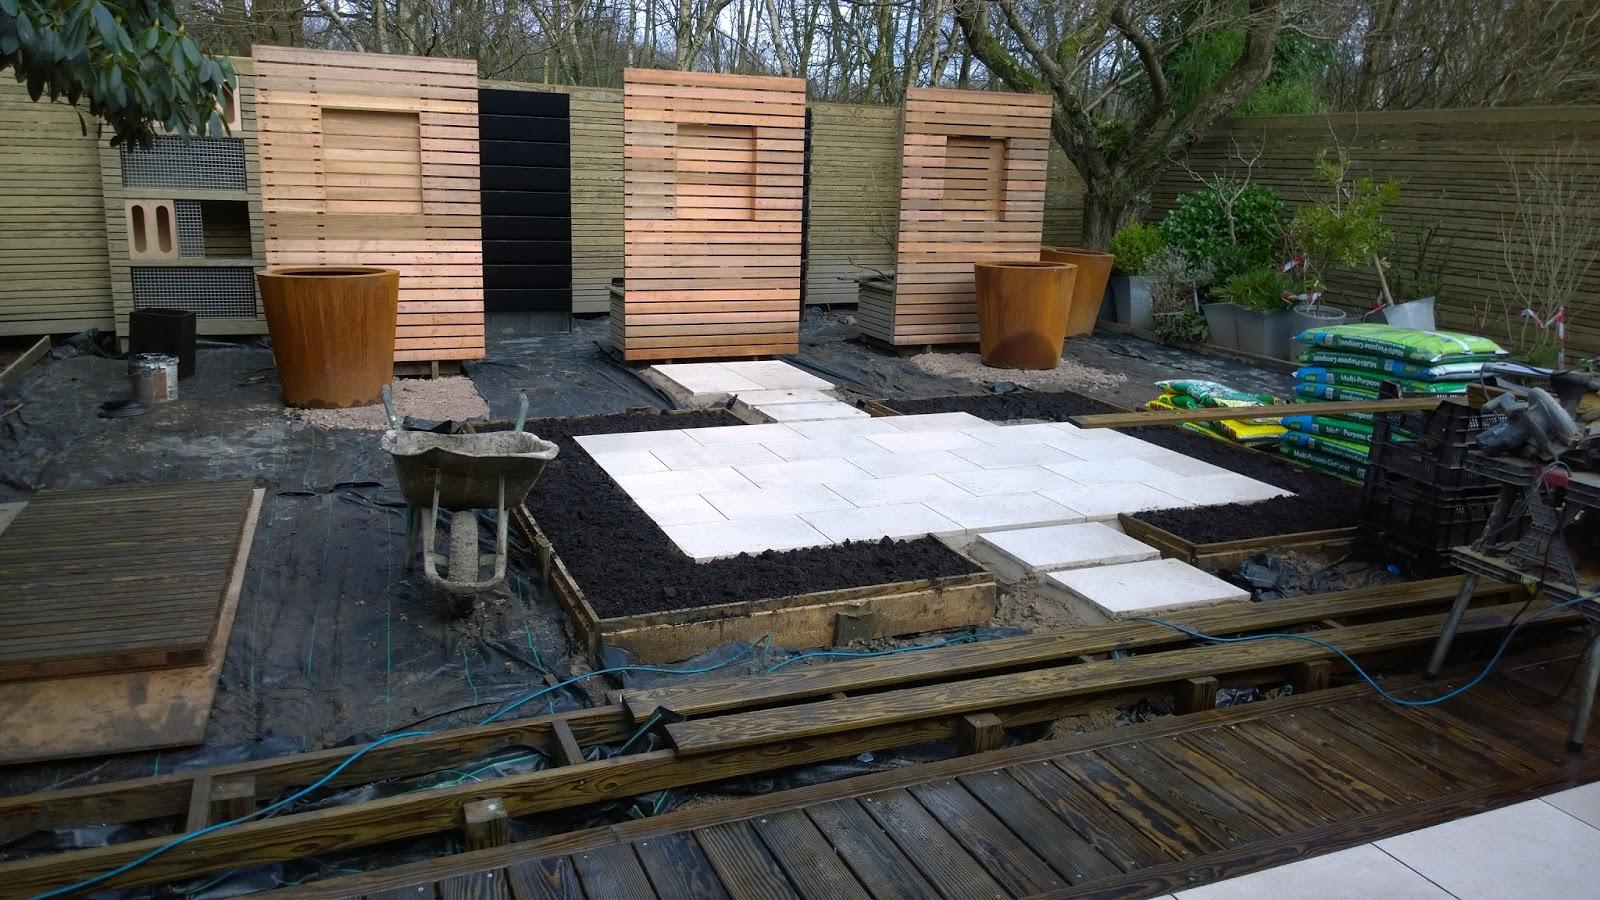 david keegans garden design blog: march 2016